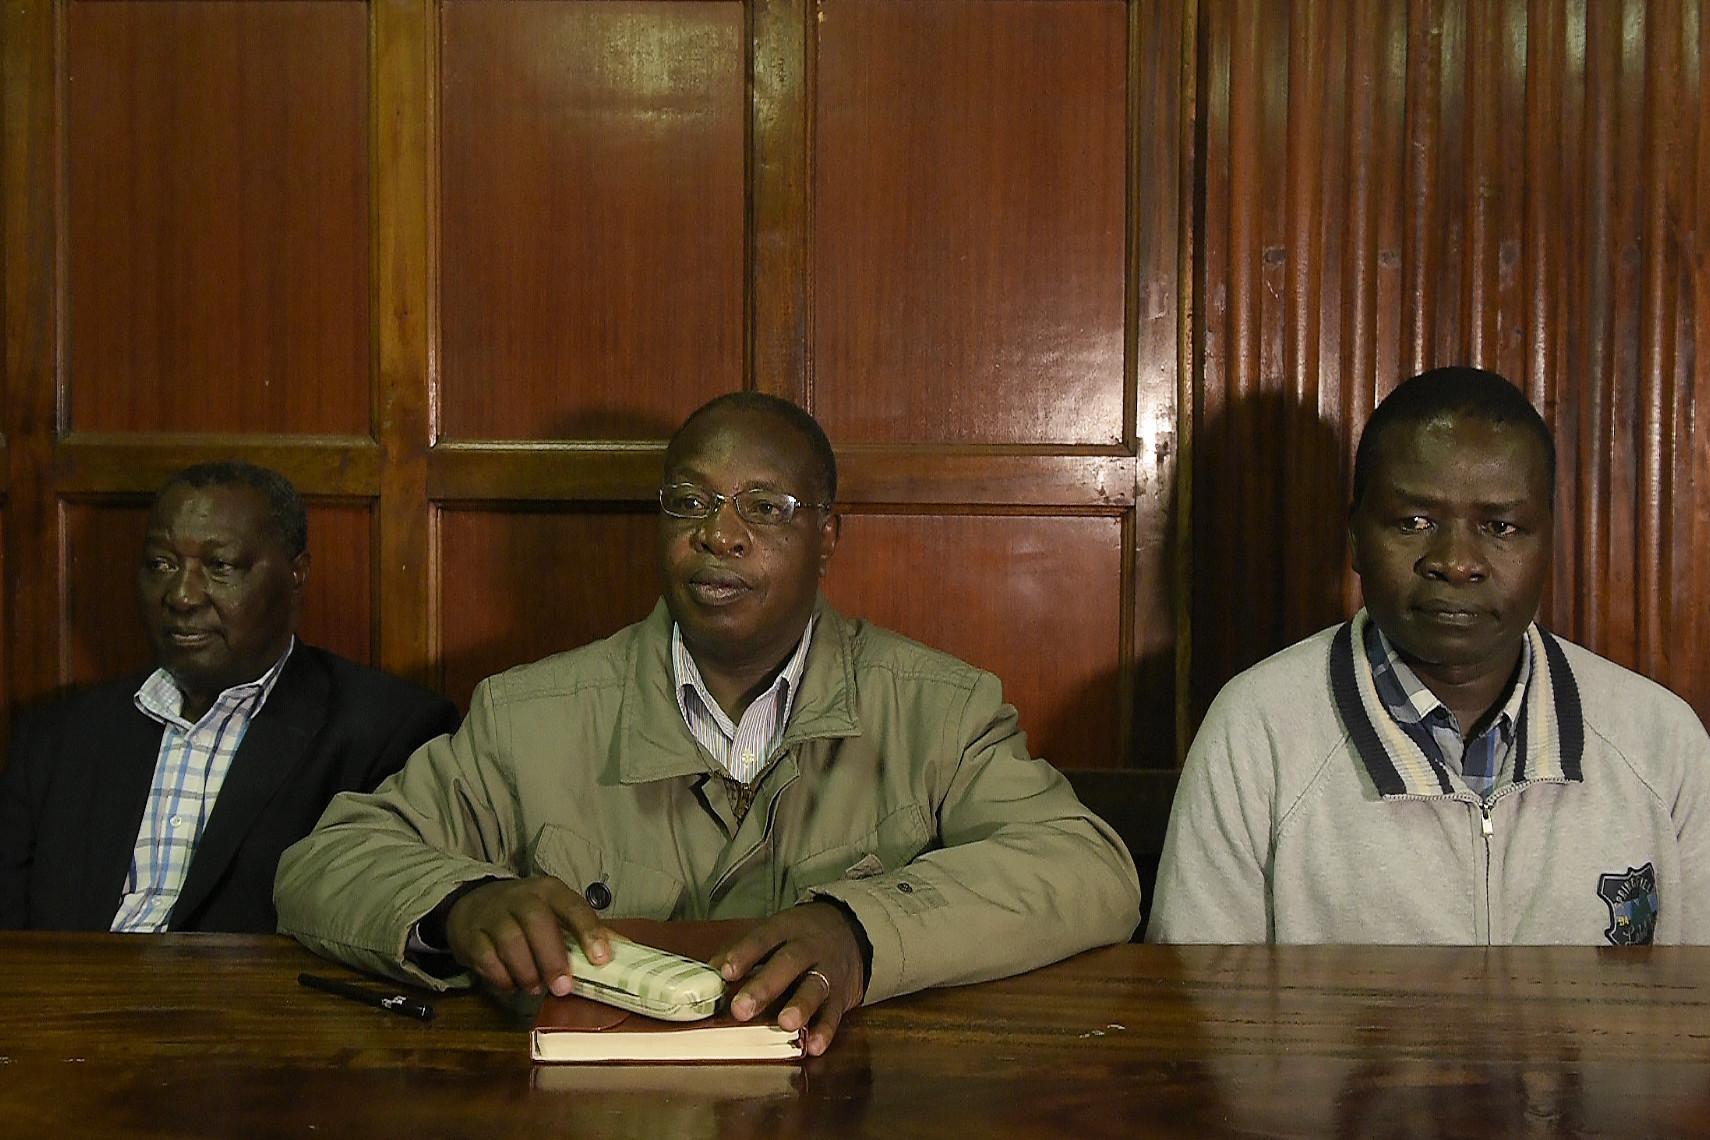 Former Kenyan NOC official denies involvement in Rio 2016 financial scandal